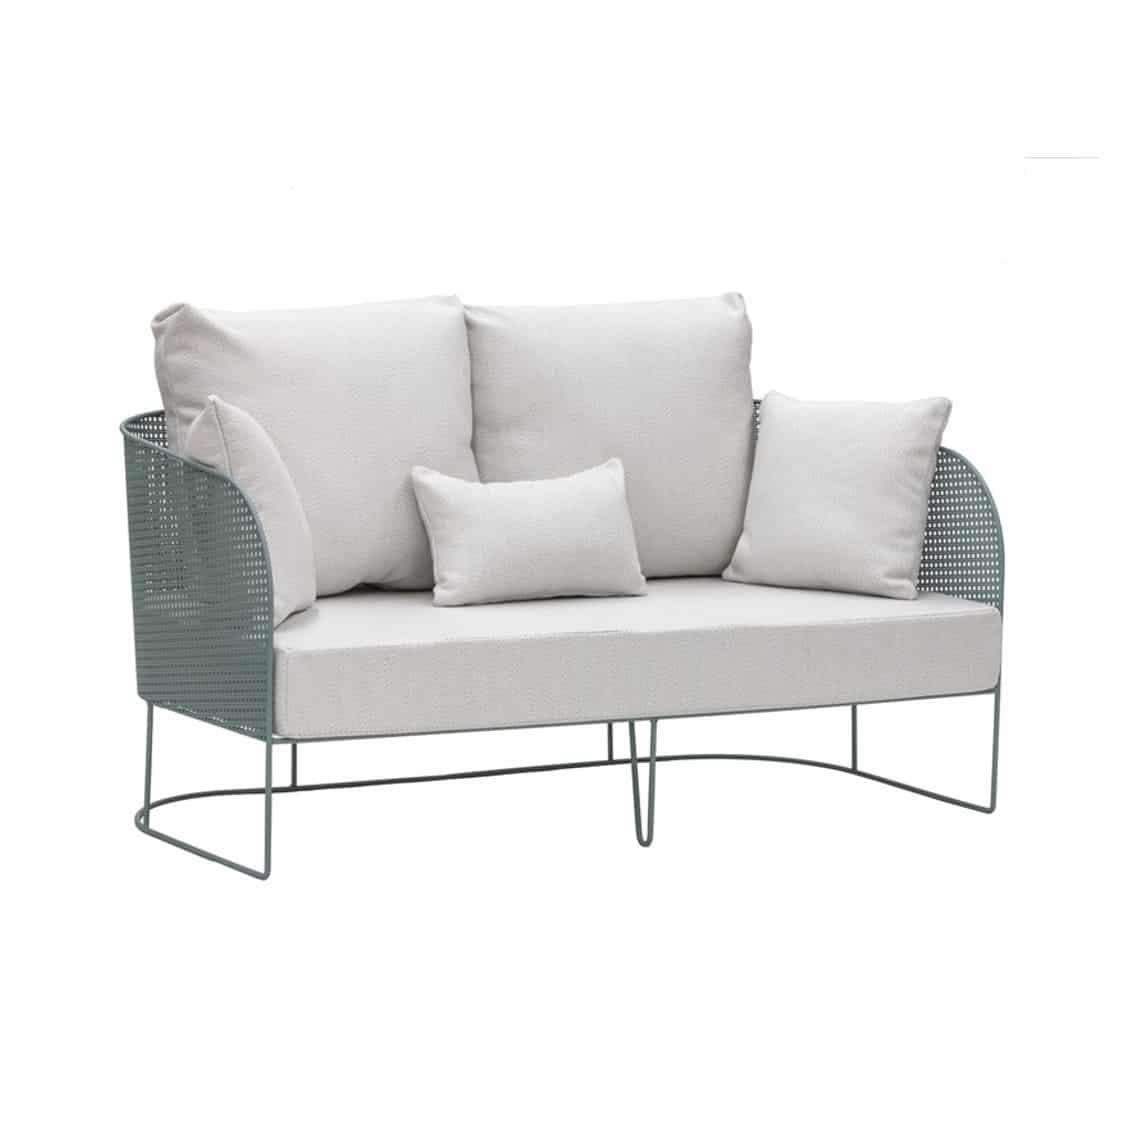 Arena Sofa Isimar at DeFrae Contract Furniture